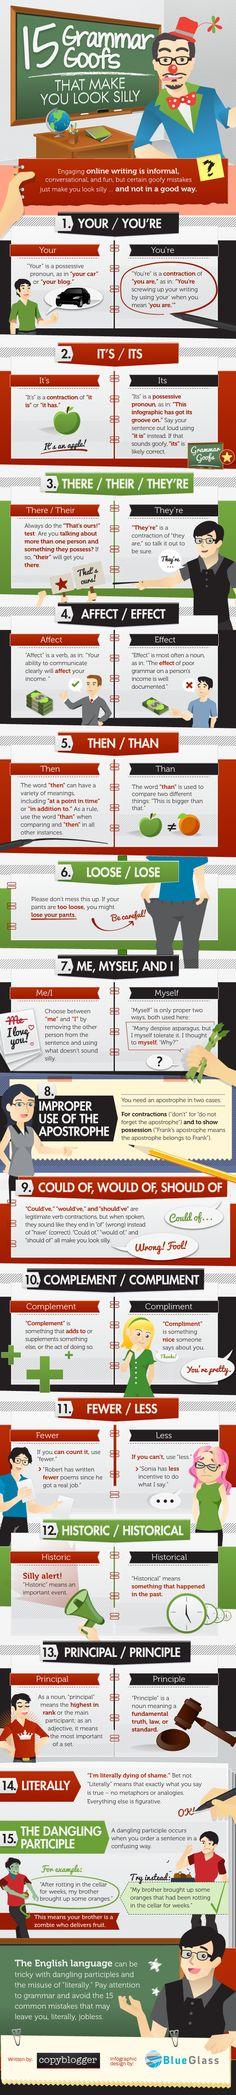 29 best Resumes, CVu0027s, \ Portfolios images on Pinterest - top 10 resume mistakes